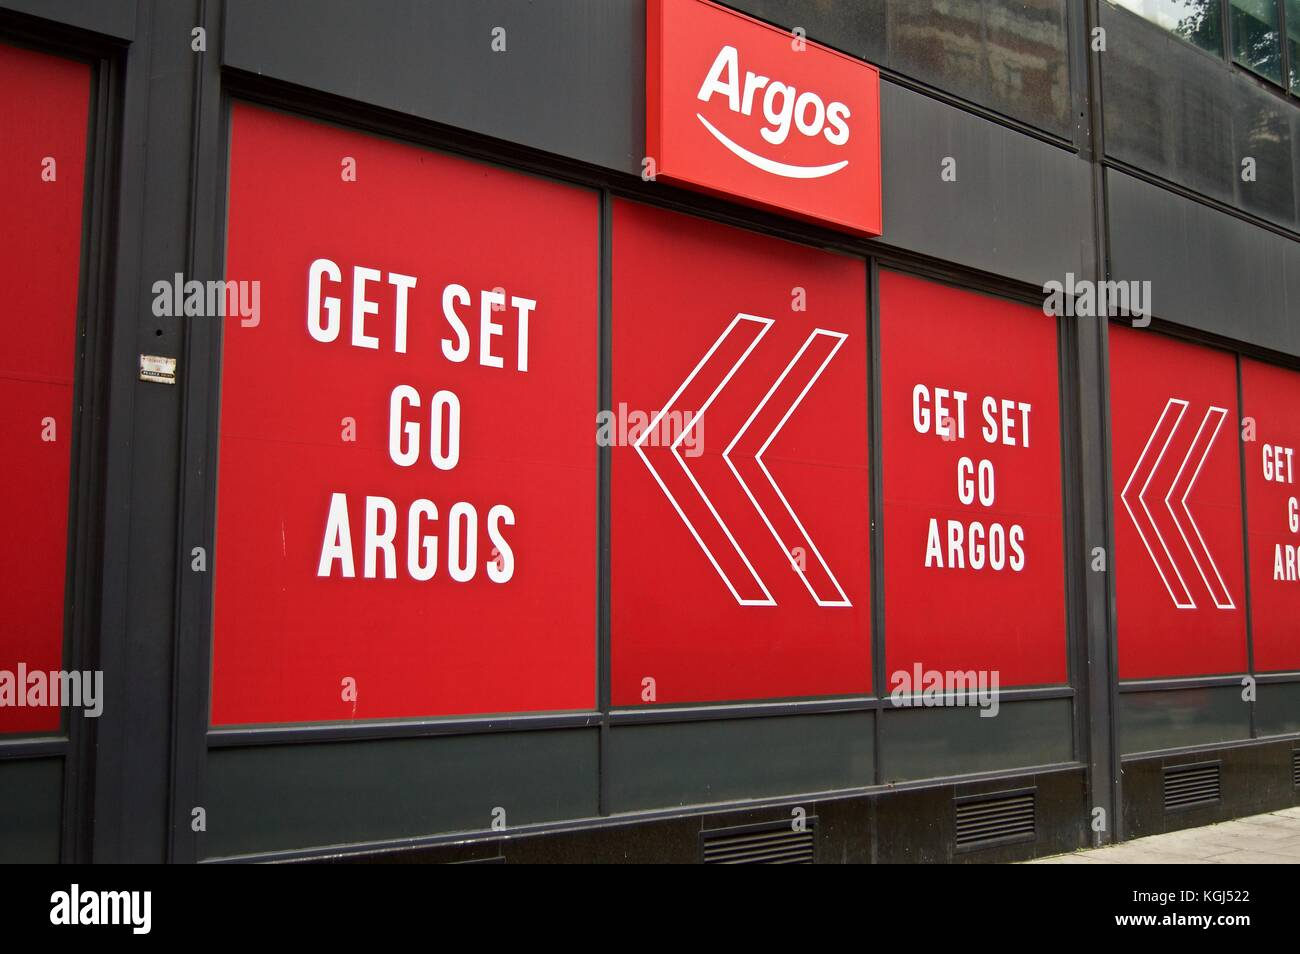 argos store stock photos argos store stock images alamy. Black Bedroom Furniture Sets. Home Design Ideas